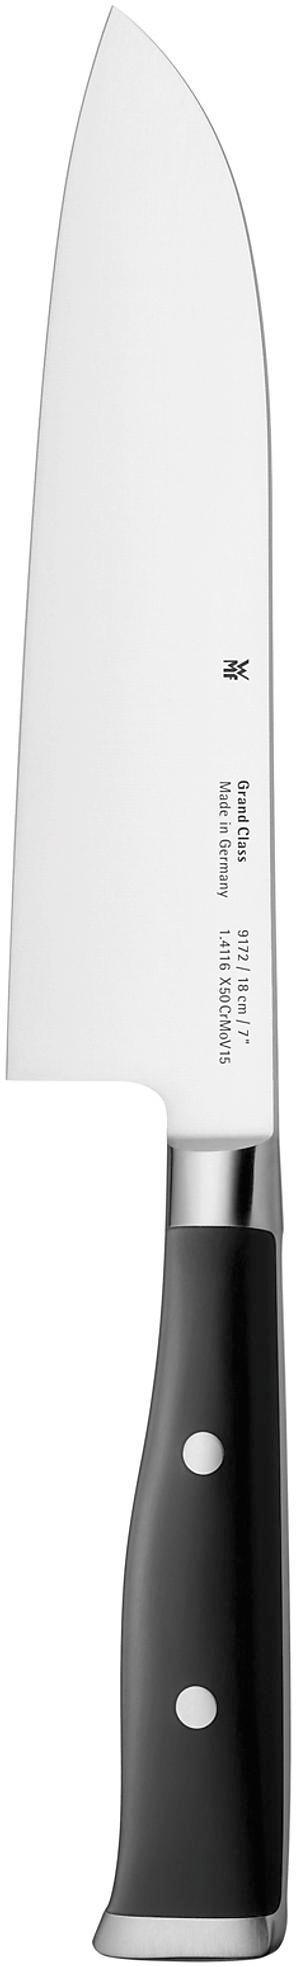 SANTOKUMESSER  Stahl  33 cm - Edelstahlfarben/Schwarz, Basics, Kunststoff/Metall (33cm) - WMF